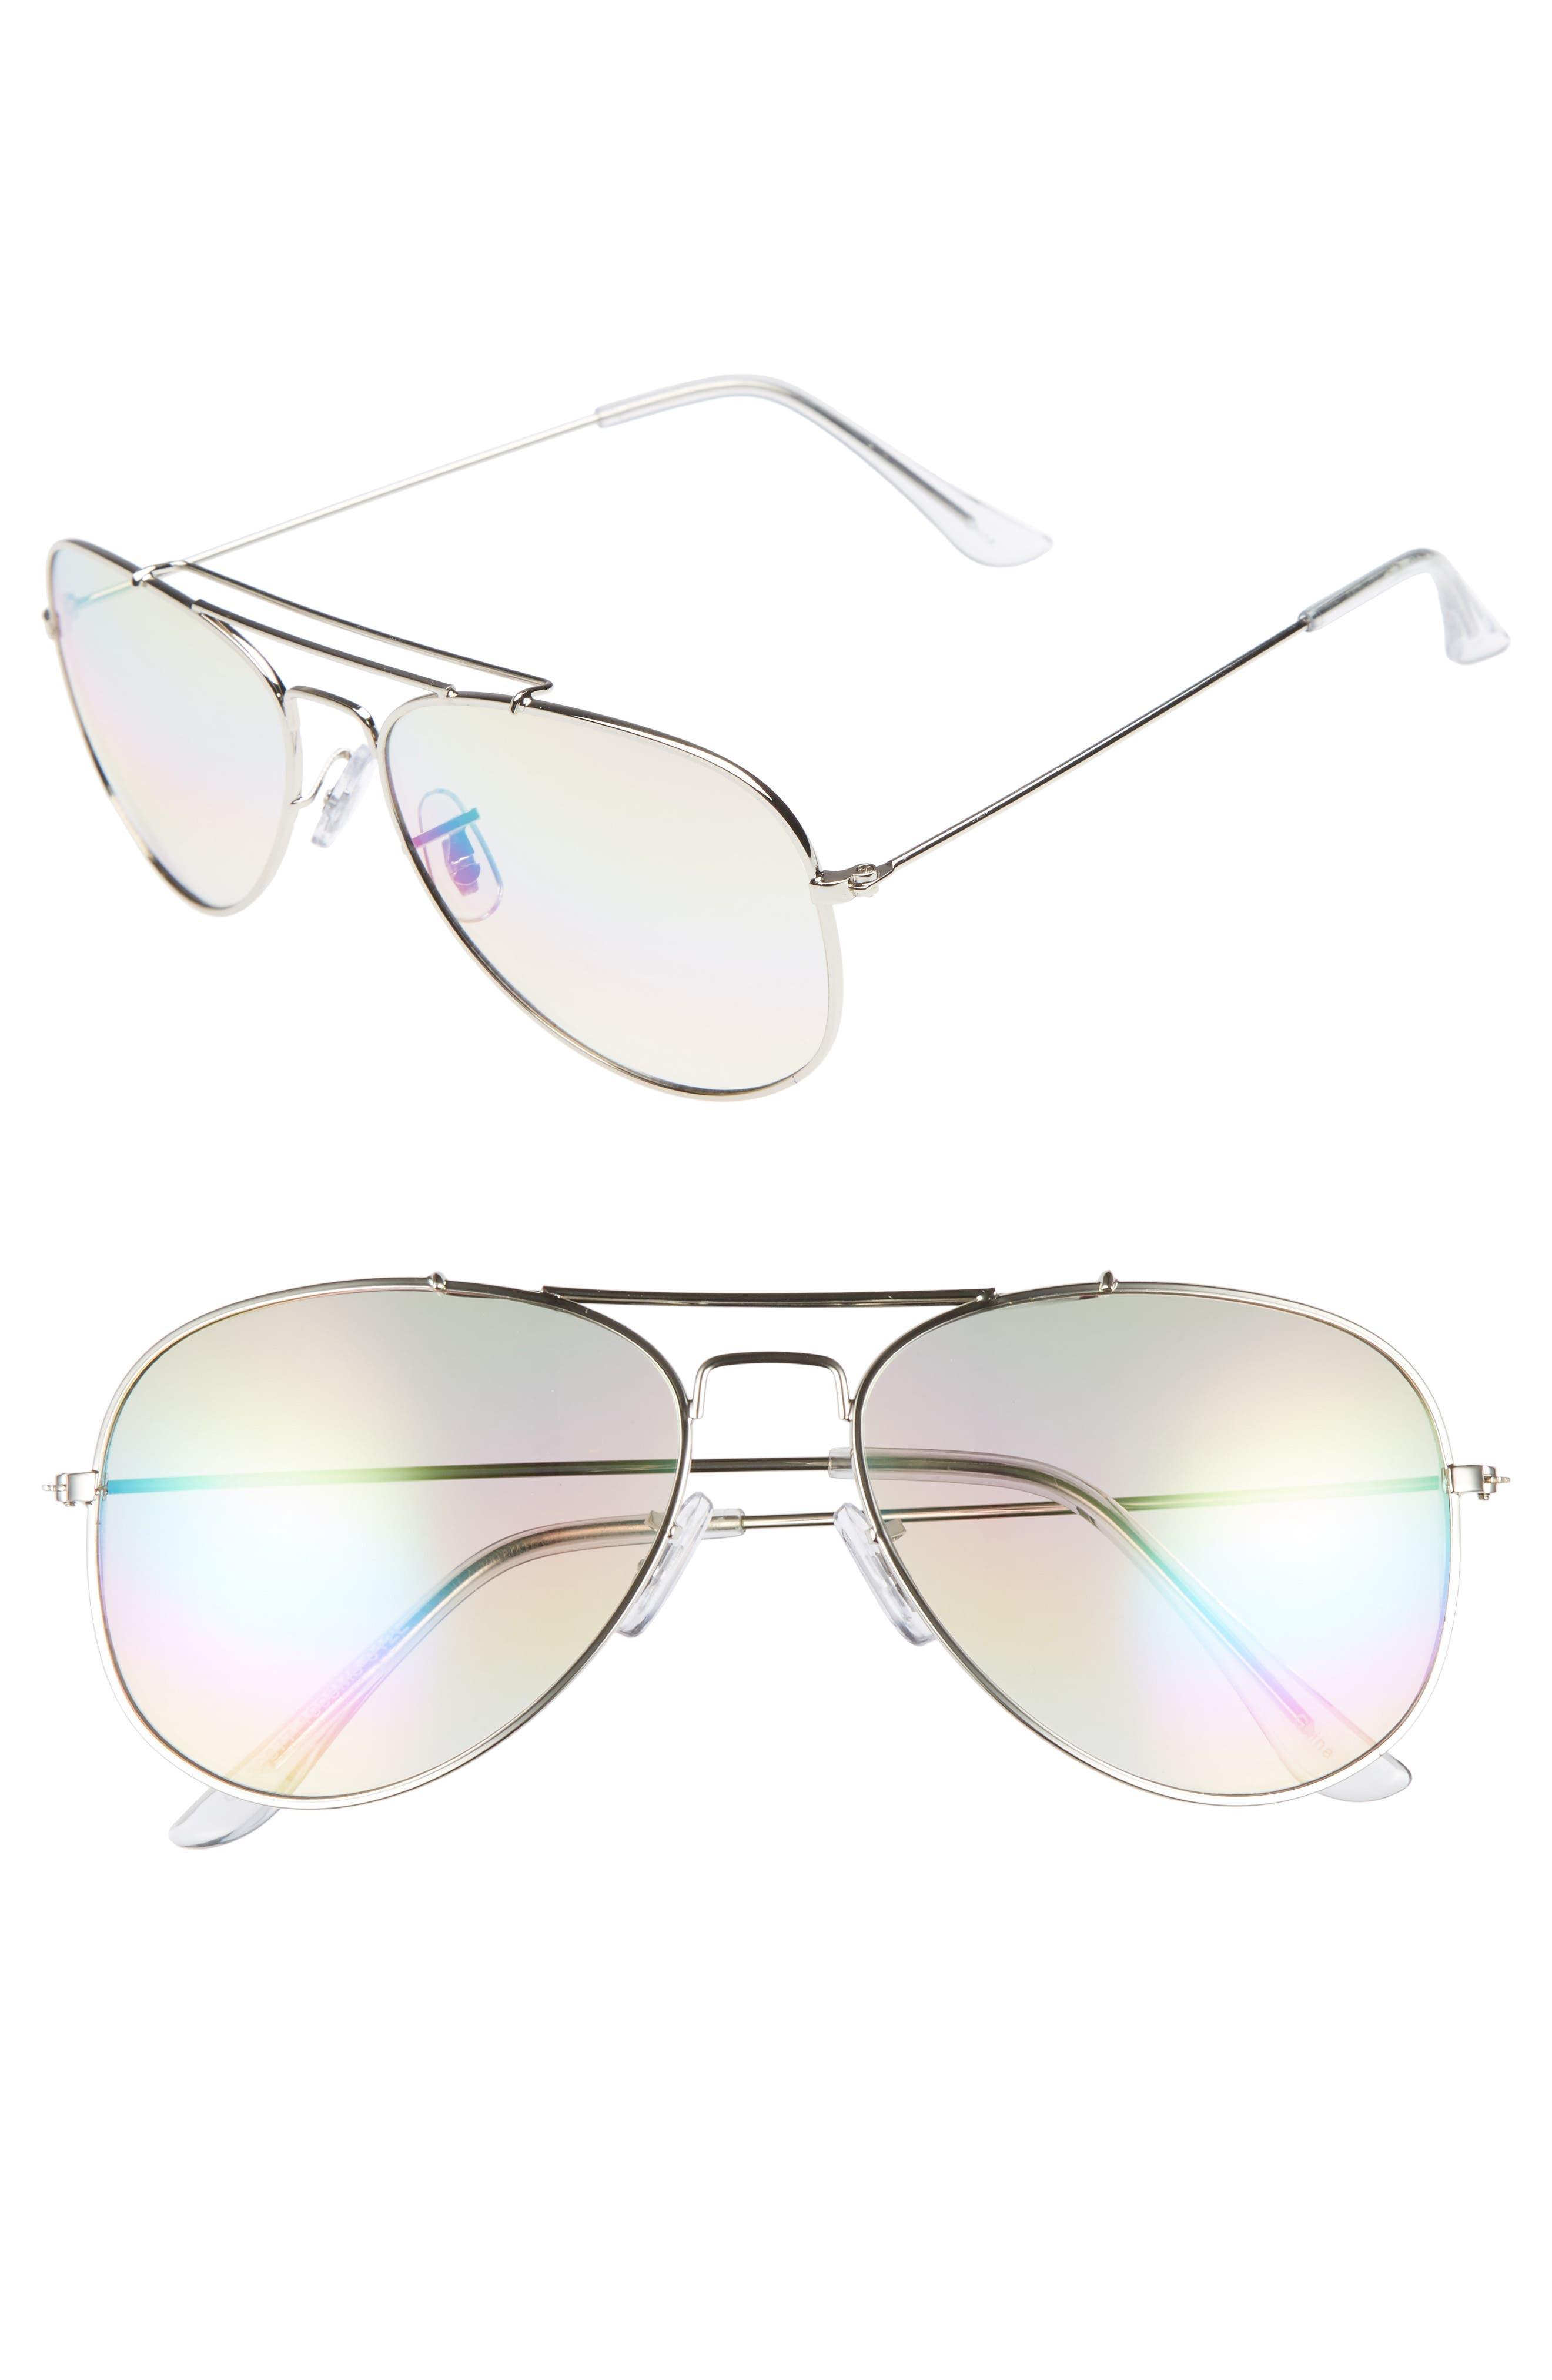 Rainbow Aviator Sunglasses,                         Main,                         color, Silver/ Multi